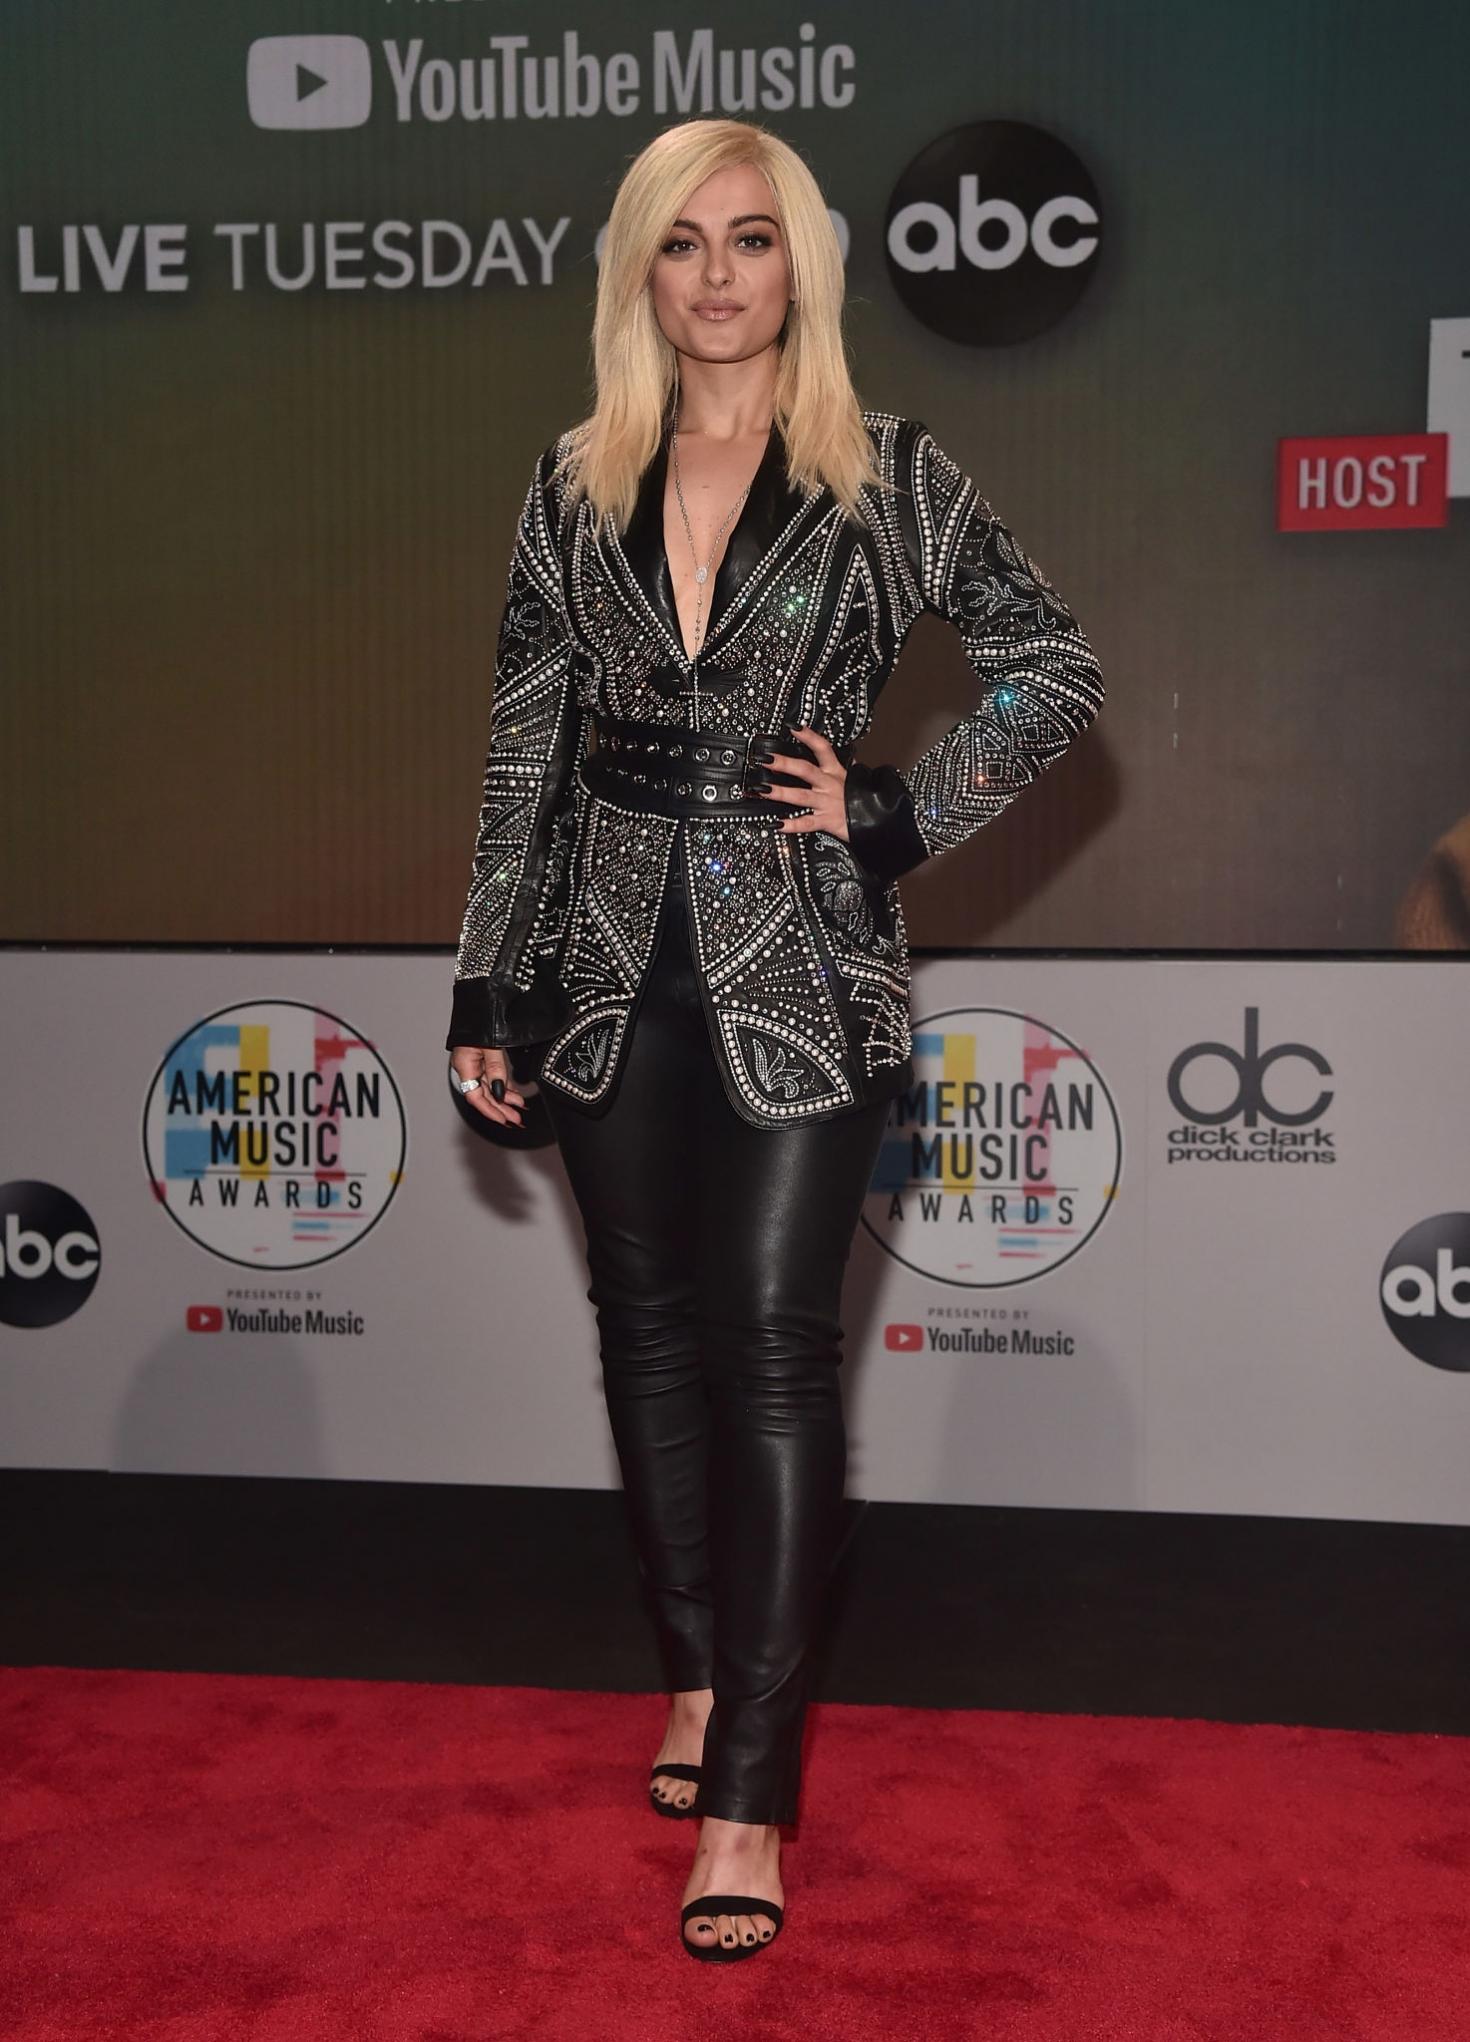 Bebe Rexha 2018 : Bebe Rexha: 2018 American Music Awards Nominations Announcement -09